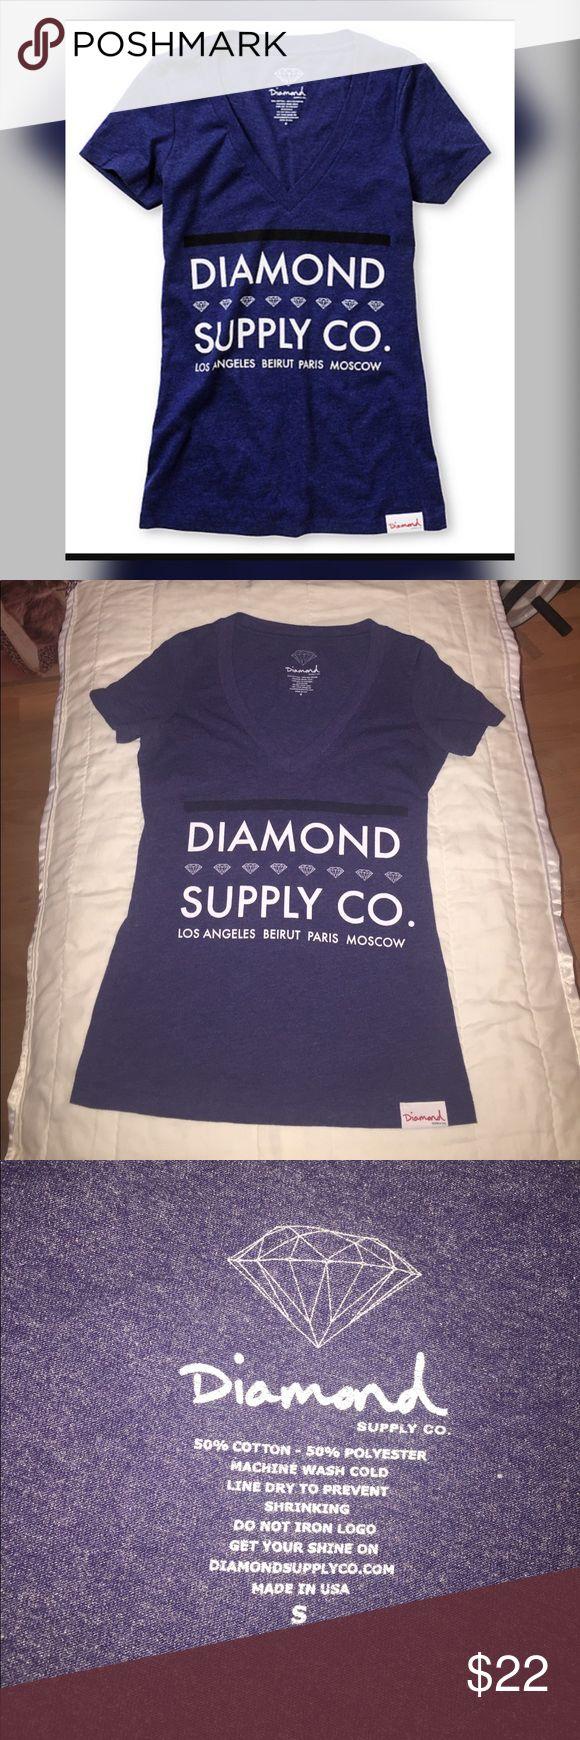 Diamond Supply Co Roots Dark Blue V-Neck T-Shirt Size small Diamond Supply Co Roots Dark Blue V-Neck T-Shirt . Excellent condition. Diamond Supply Co. Tops Tees - Short Sleeve